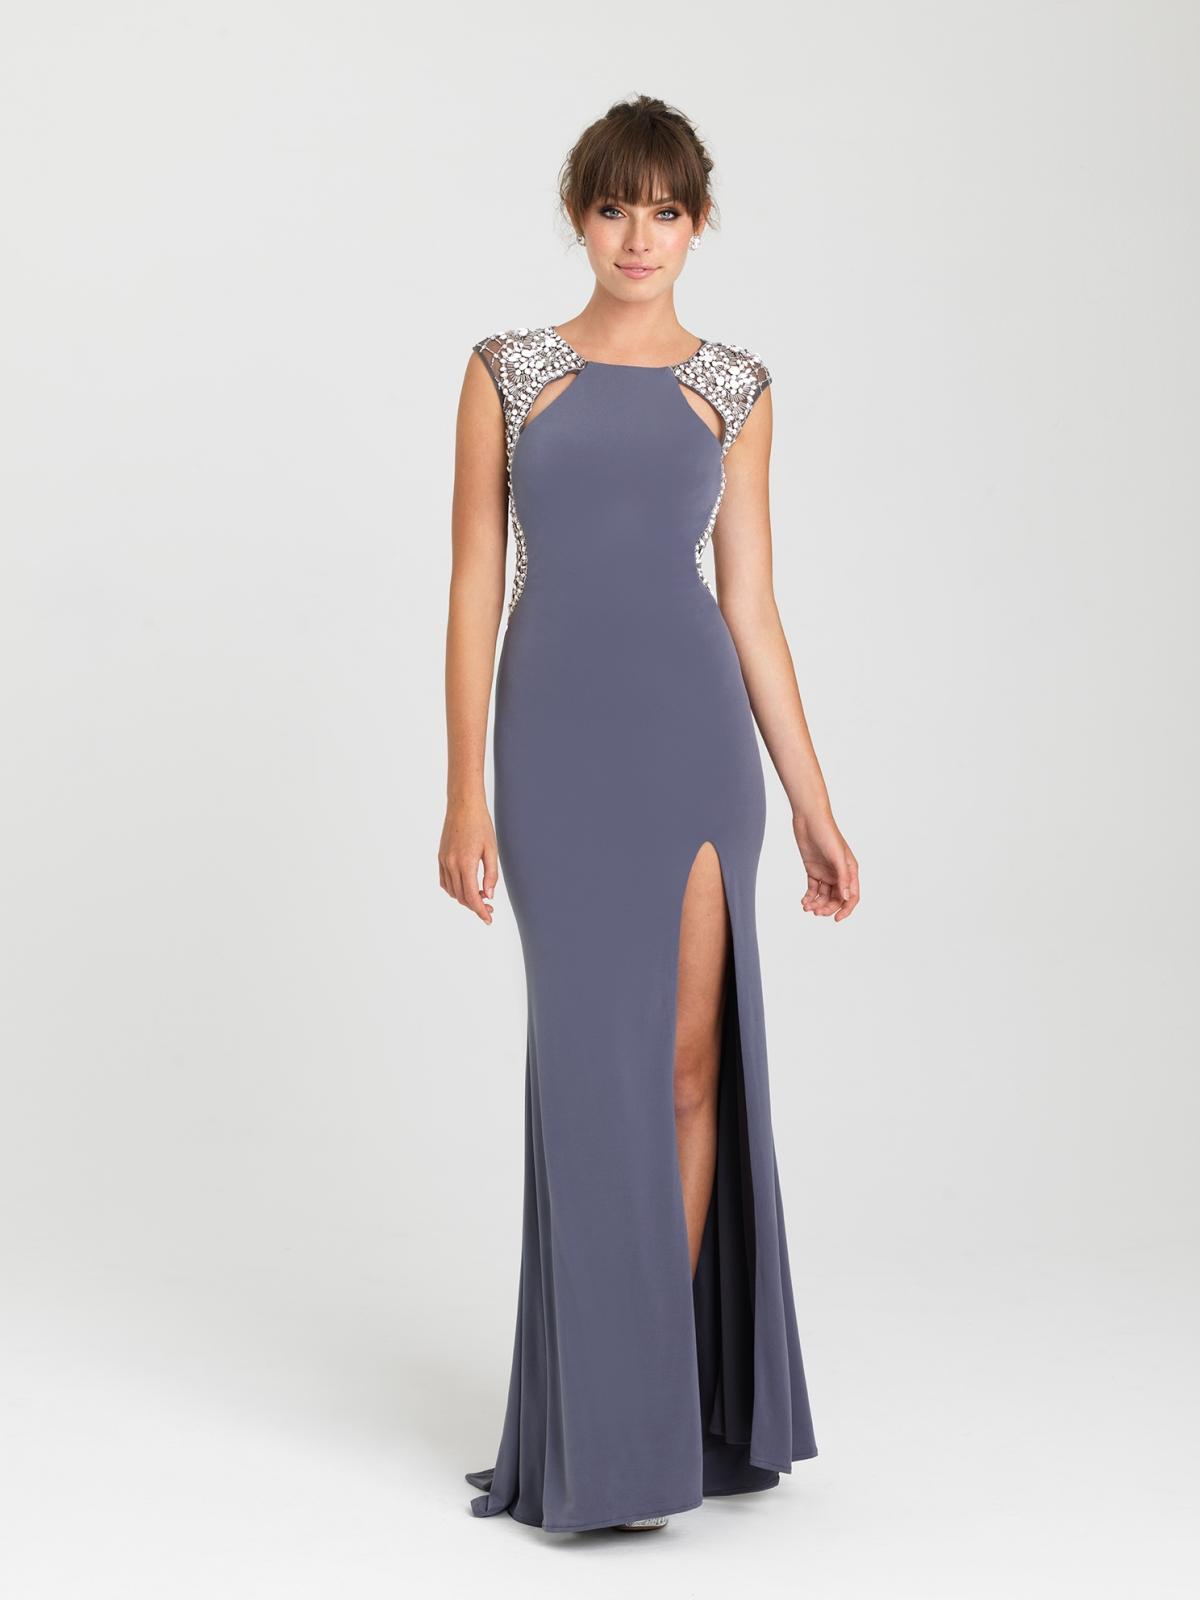 Madison James 16 417 Prom Shop San Angelo 187 Bridal Boutique